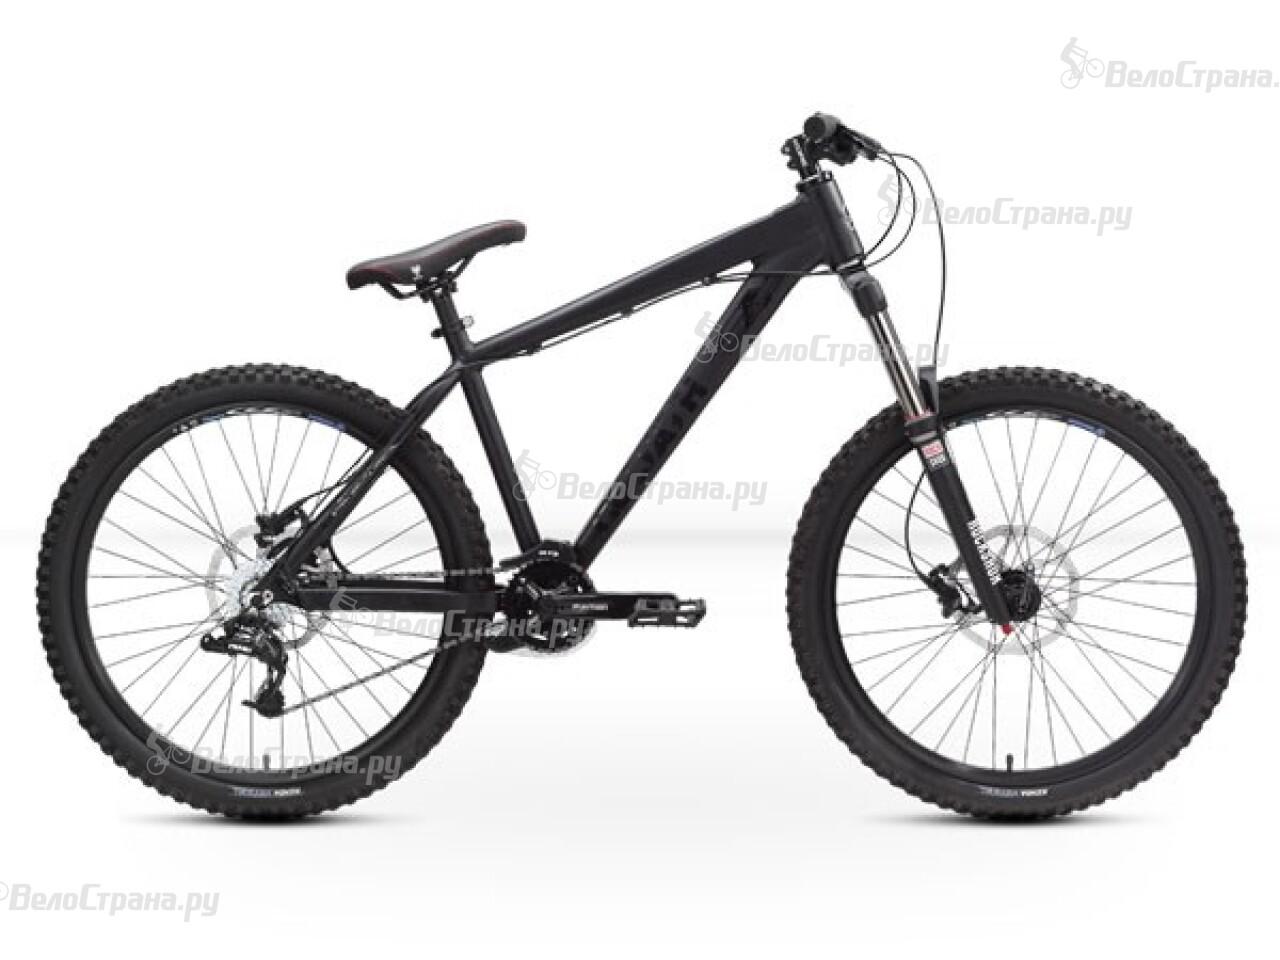 Велосипед Stark Goliath (2014) rockshox domain dual crown 2014